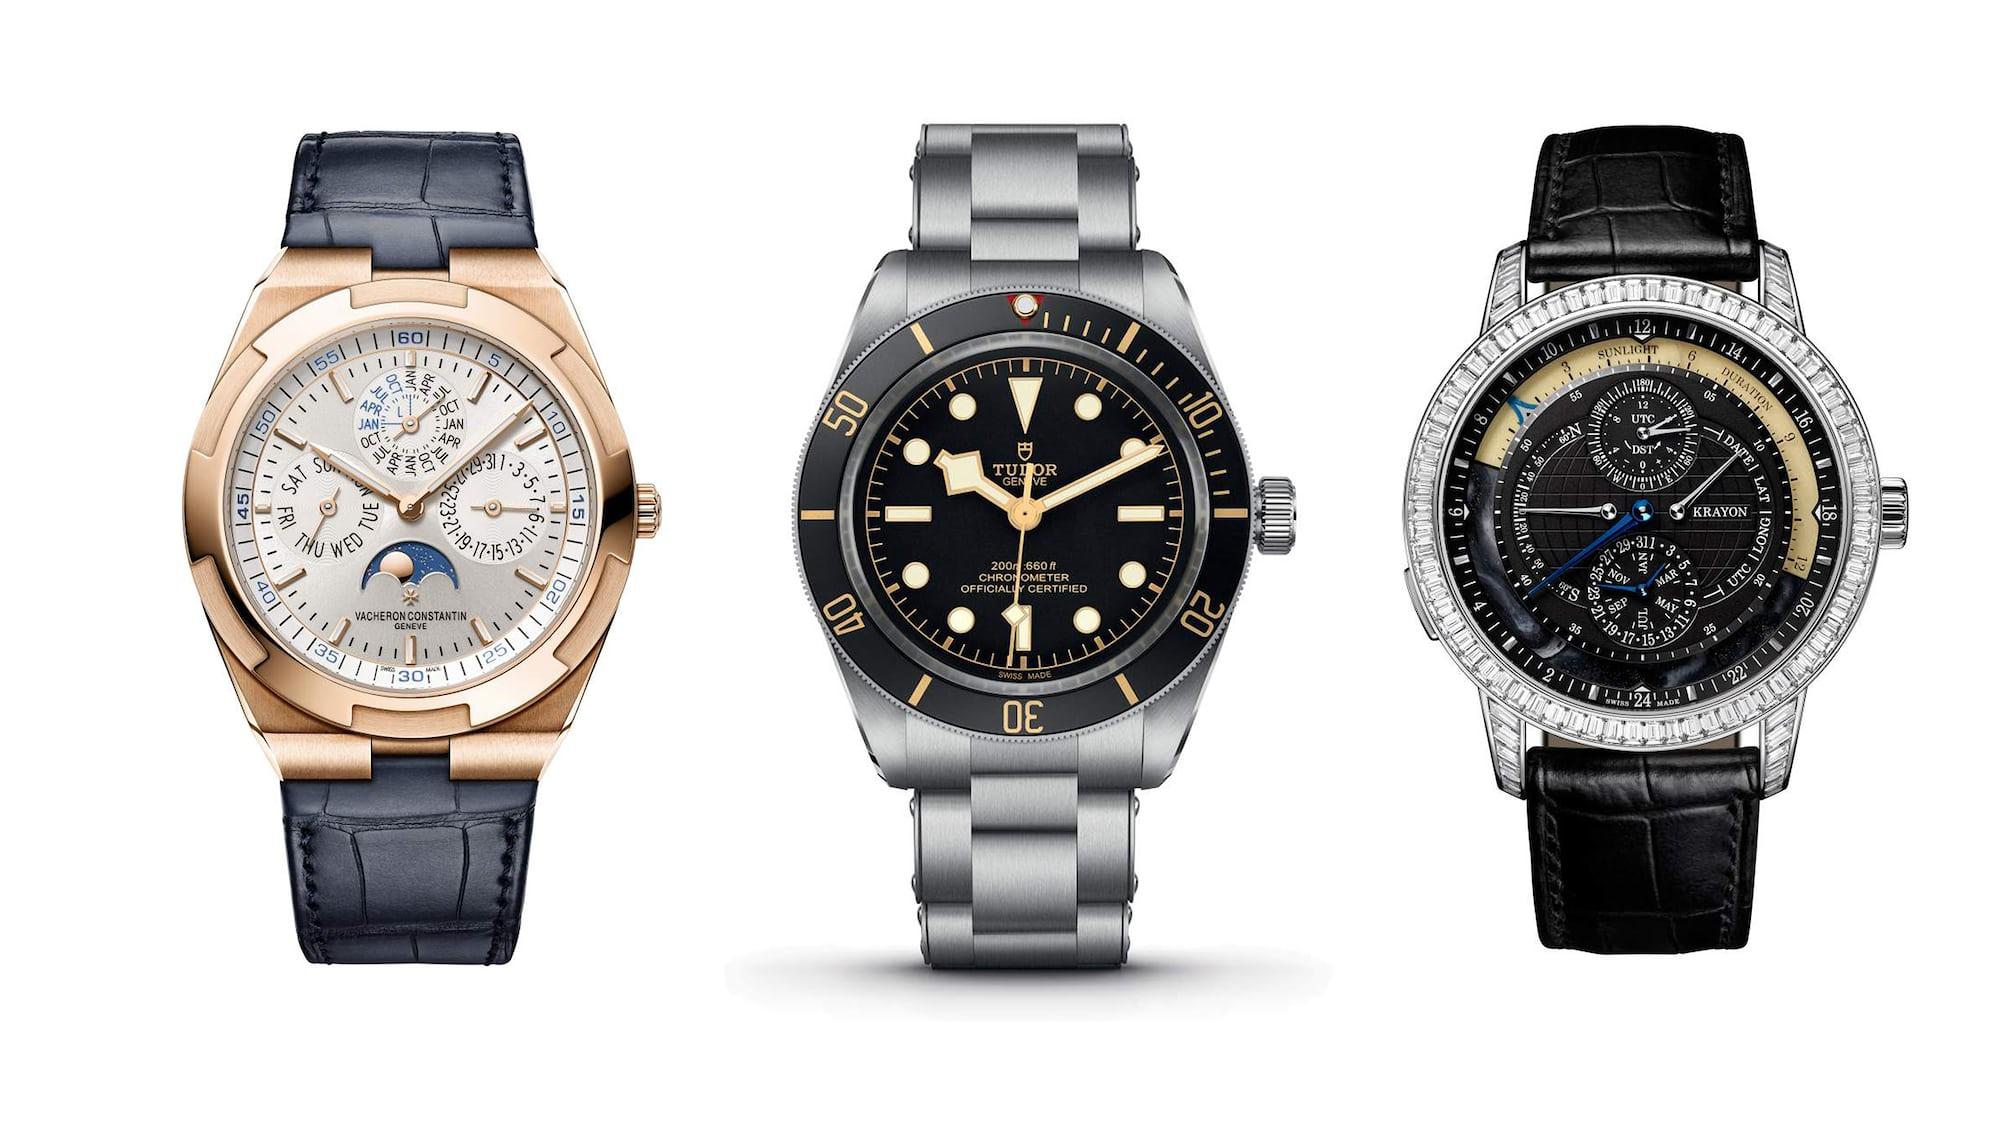 Breaking News: The Grand Prix d'Horlogerie De Genève Announces Candidate Watches For 2018 hero 2